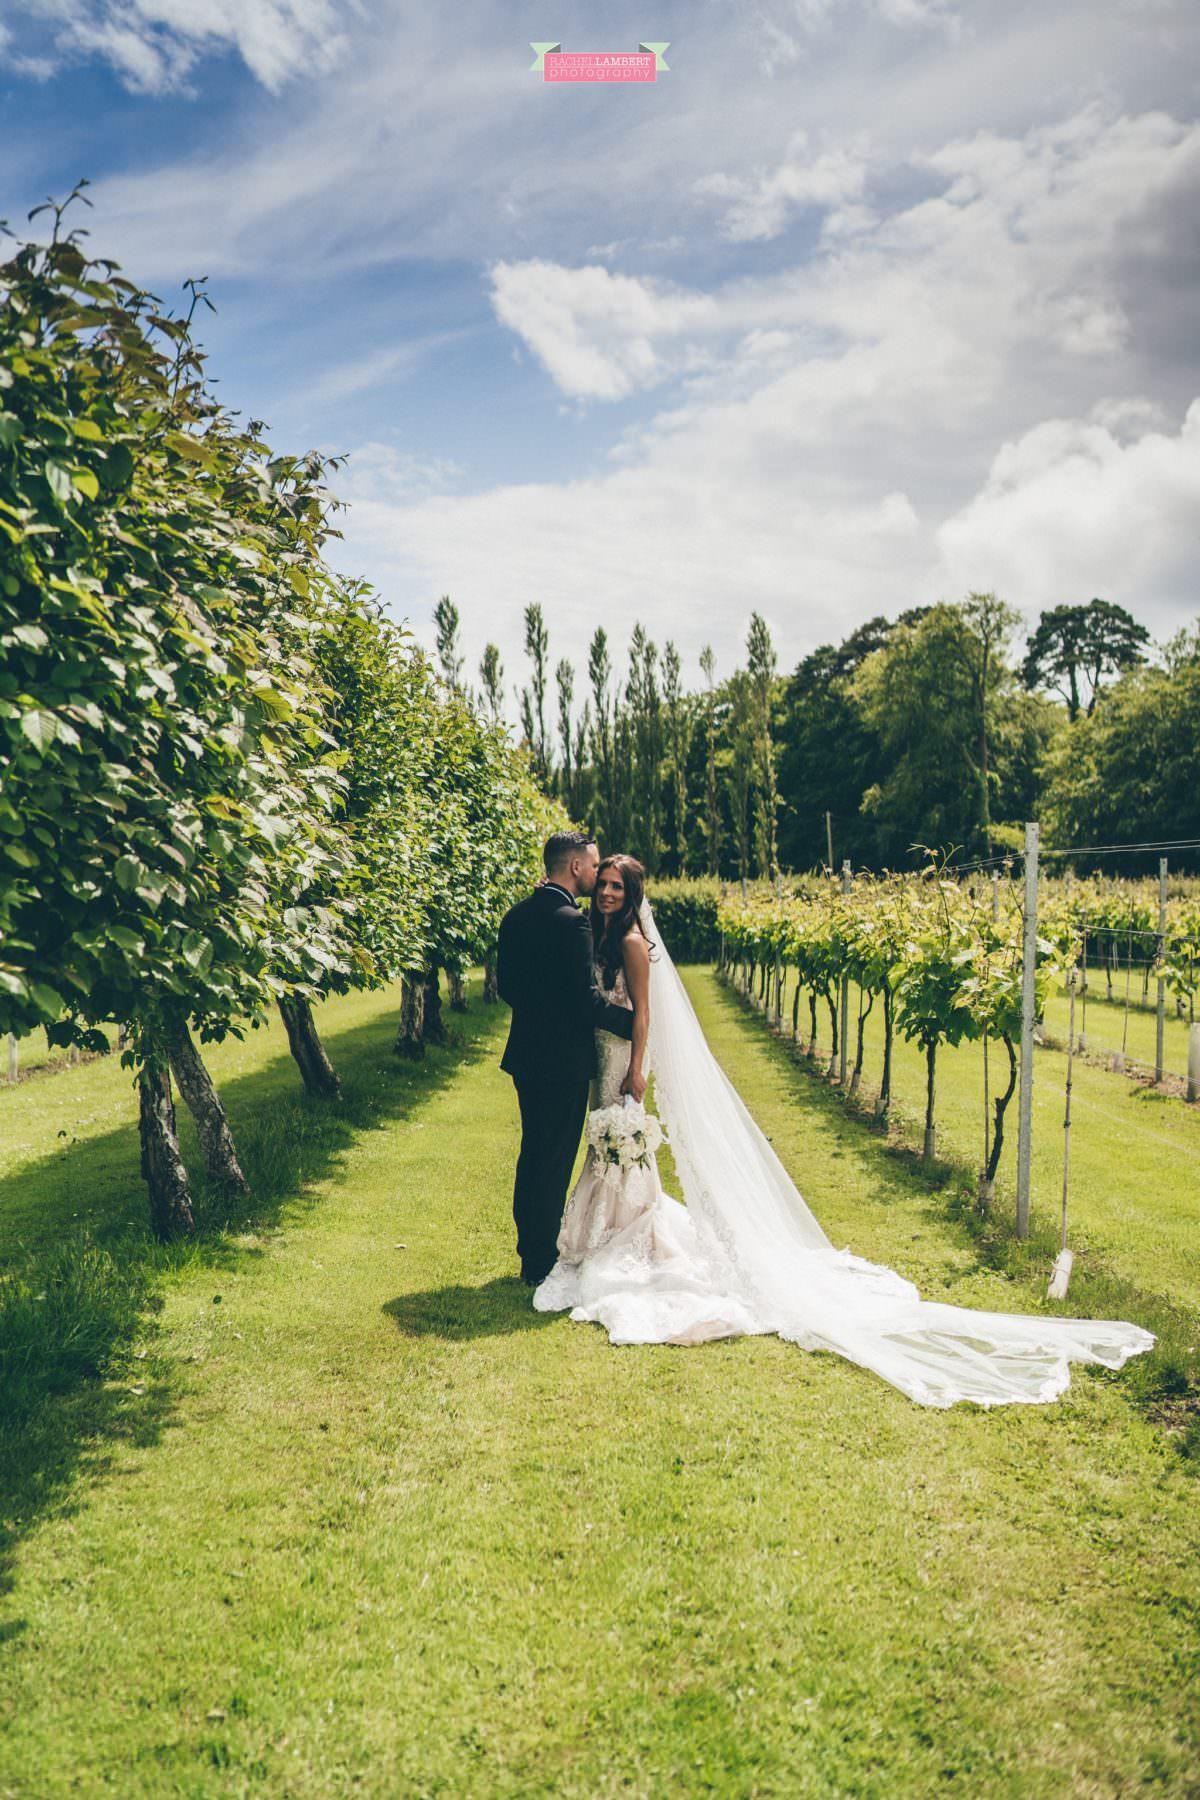 Cardiff Wedding Photographer Llanerch Vineyard rachel lambert photography bride and groom couple shots